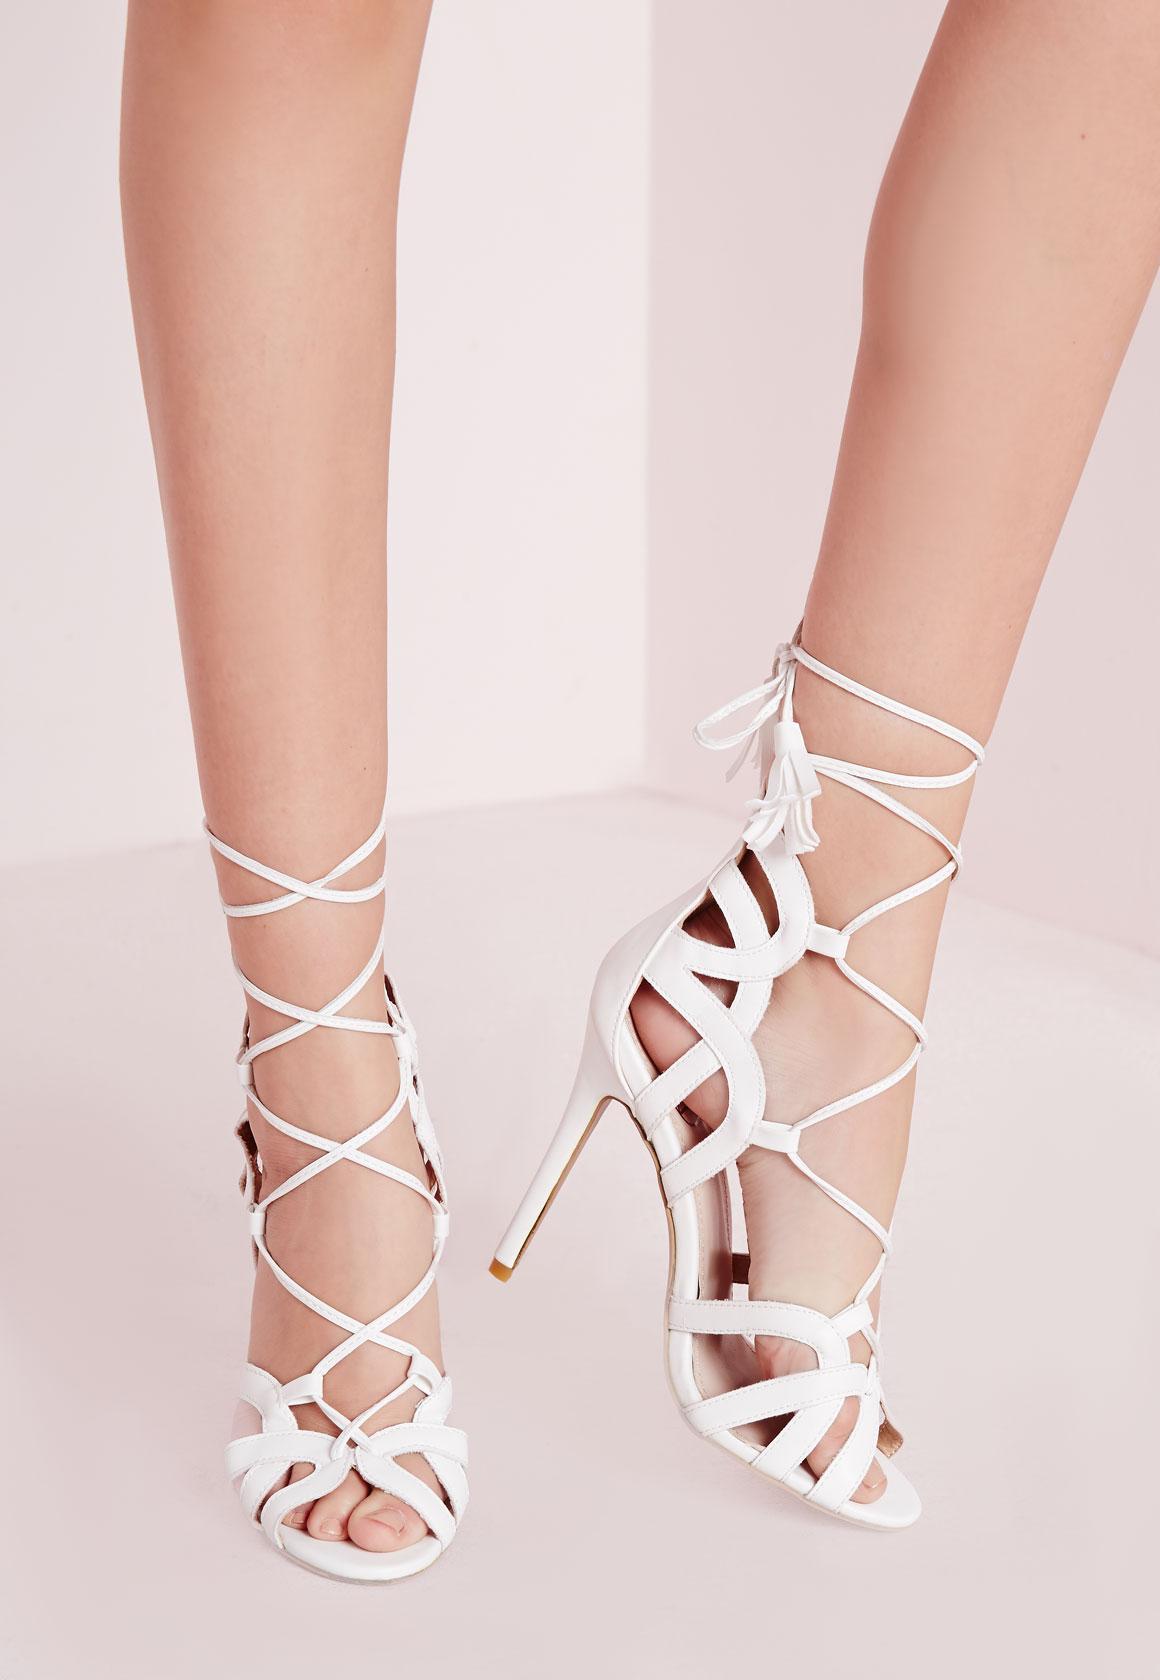 49ae2c168e4 Tassel Trim Lace Up Gladiator Sandals White | Missguided